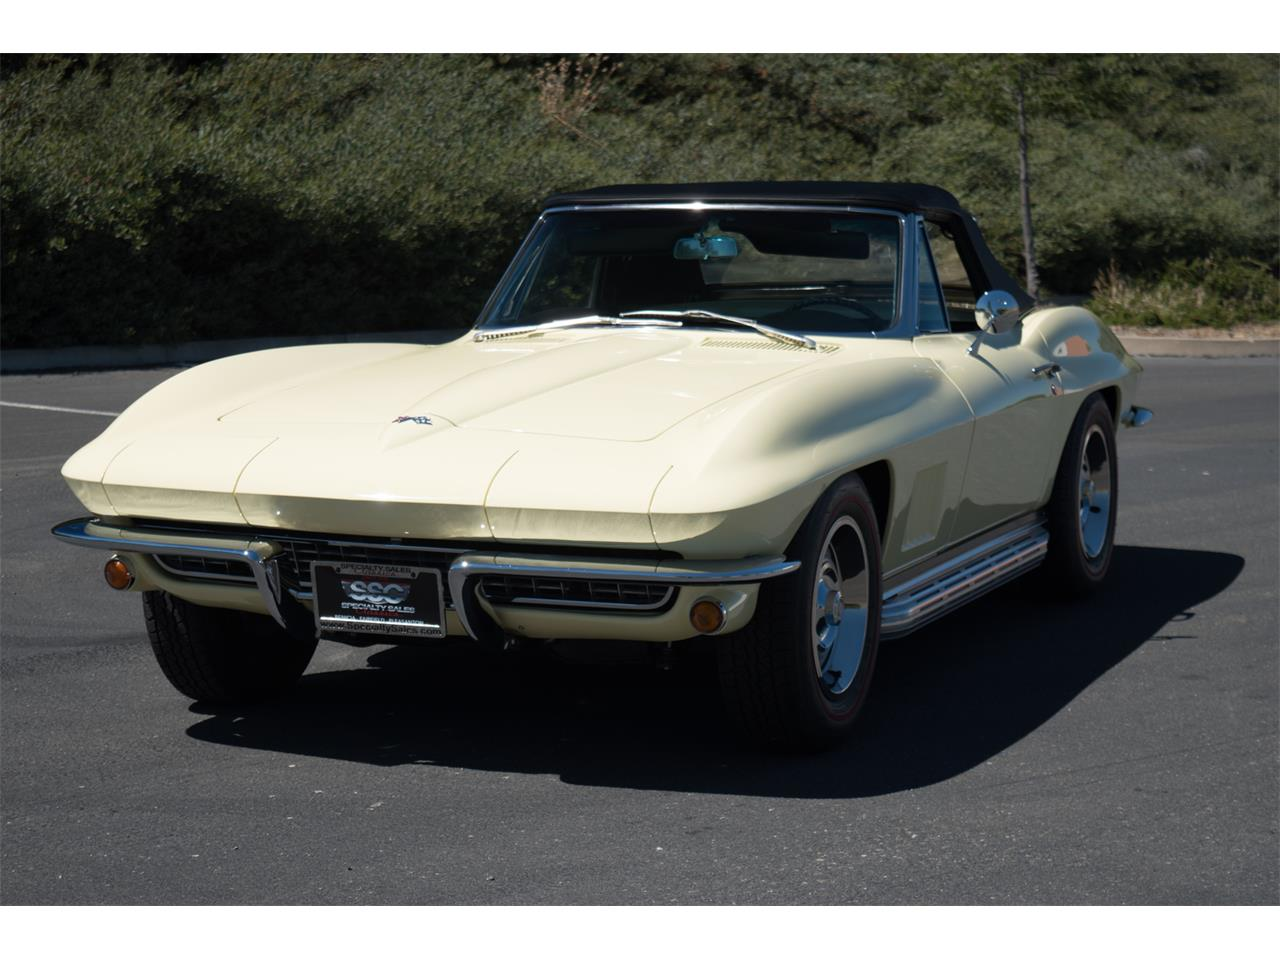 for sale 1967 chevrolet corvette in fairfield, california cars - fairfield, ca at geebo